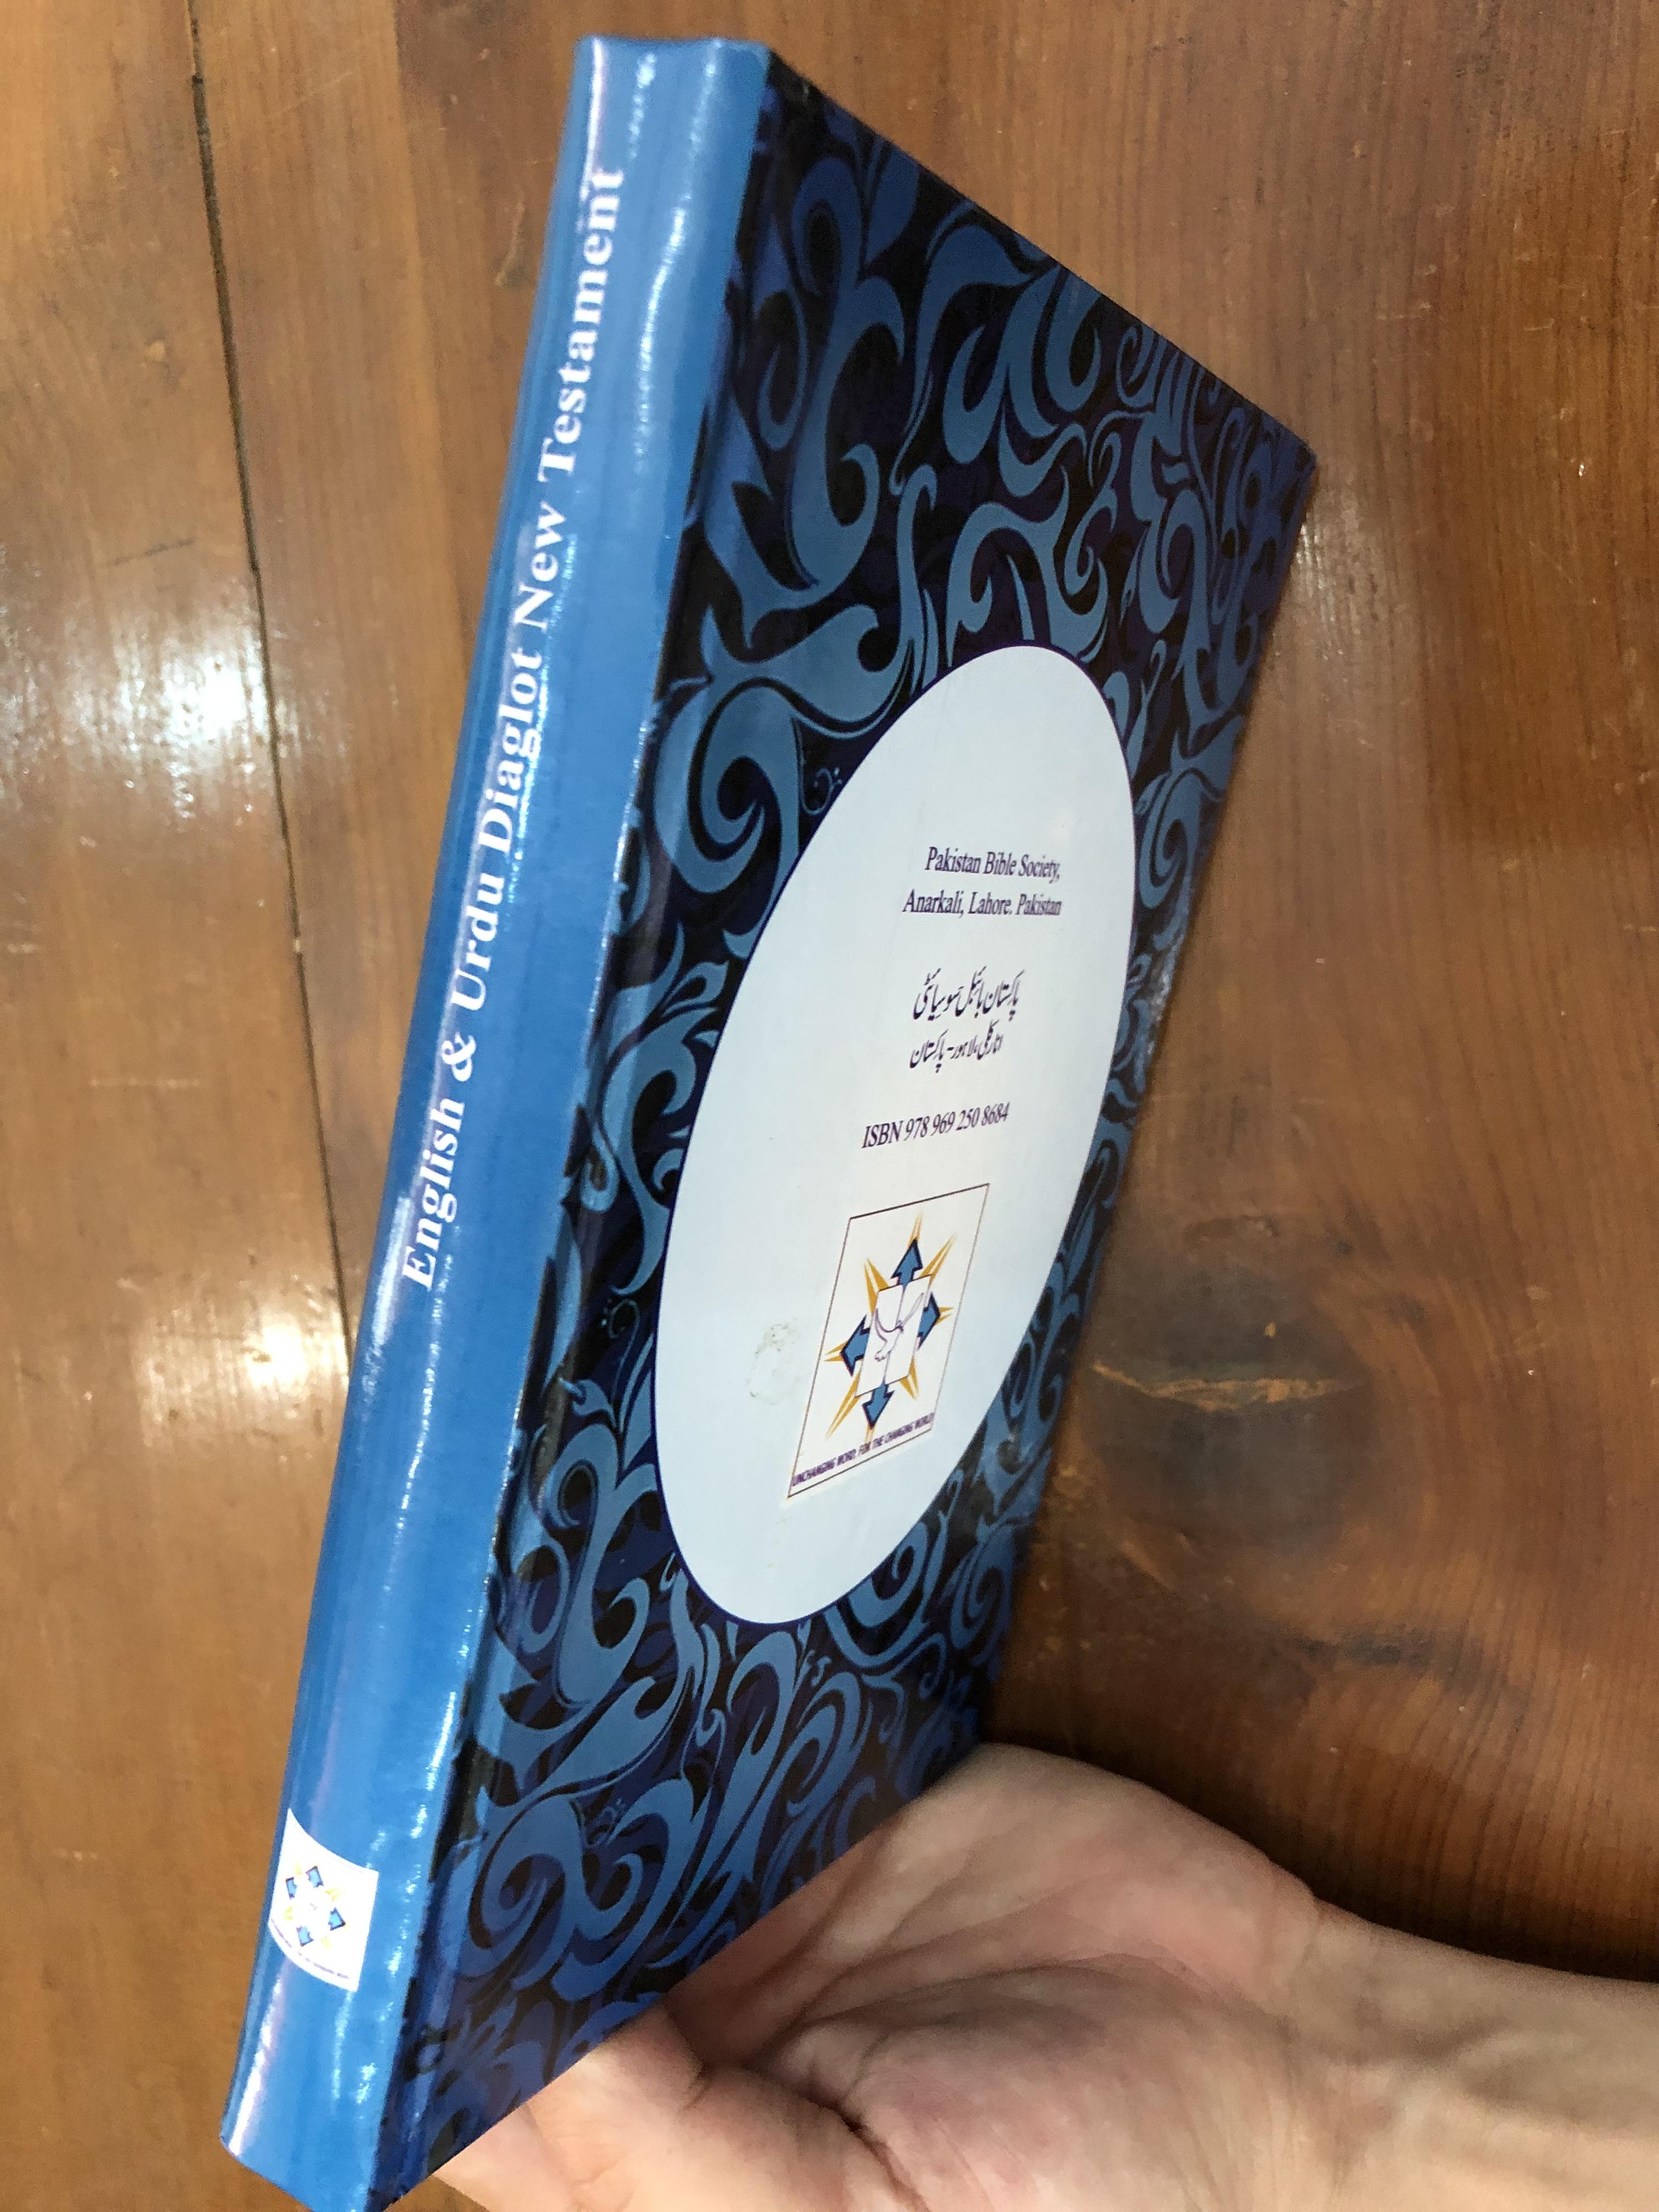 urdu-english-new-testament-the-good-news-the-new-covenant-english-urdu-diaglot-bilingual-new-testament-parallel-text-14-.jpg